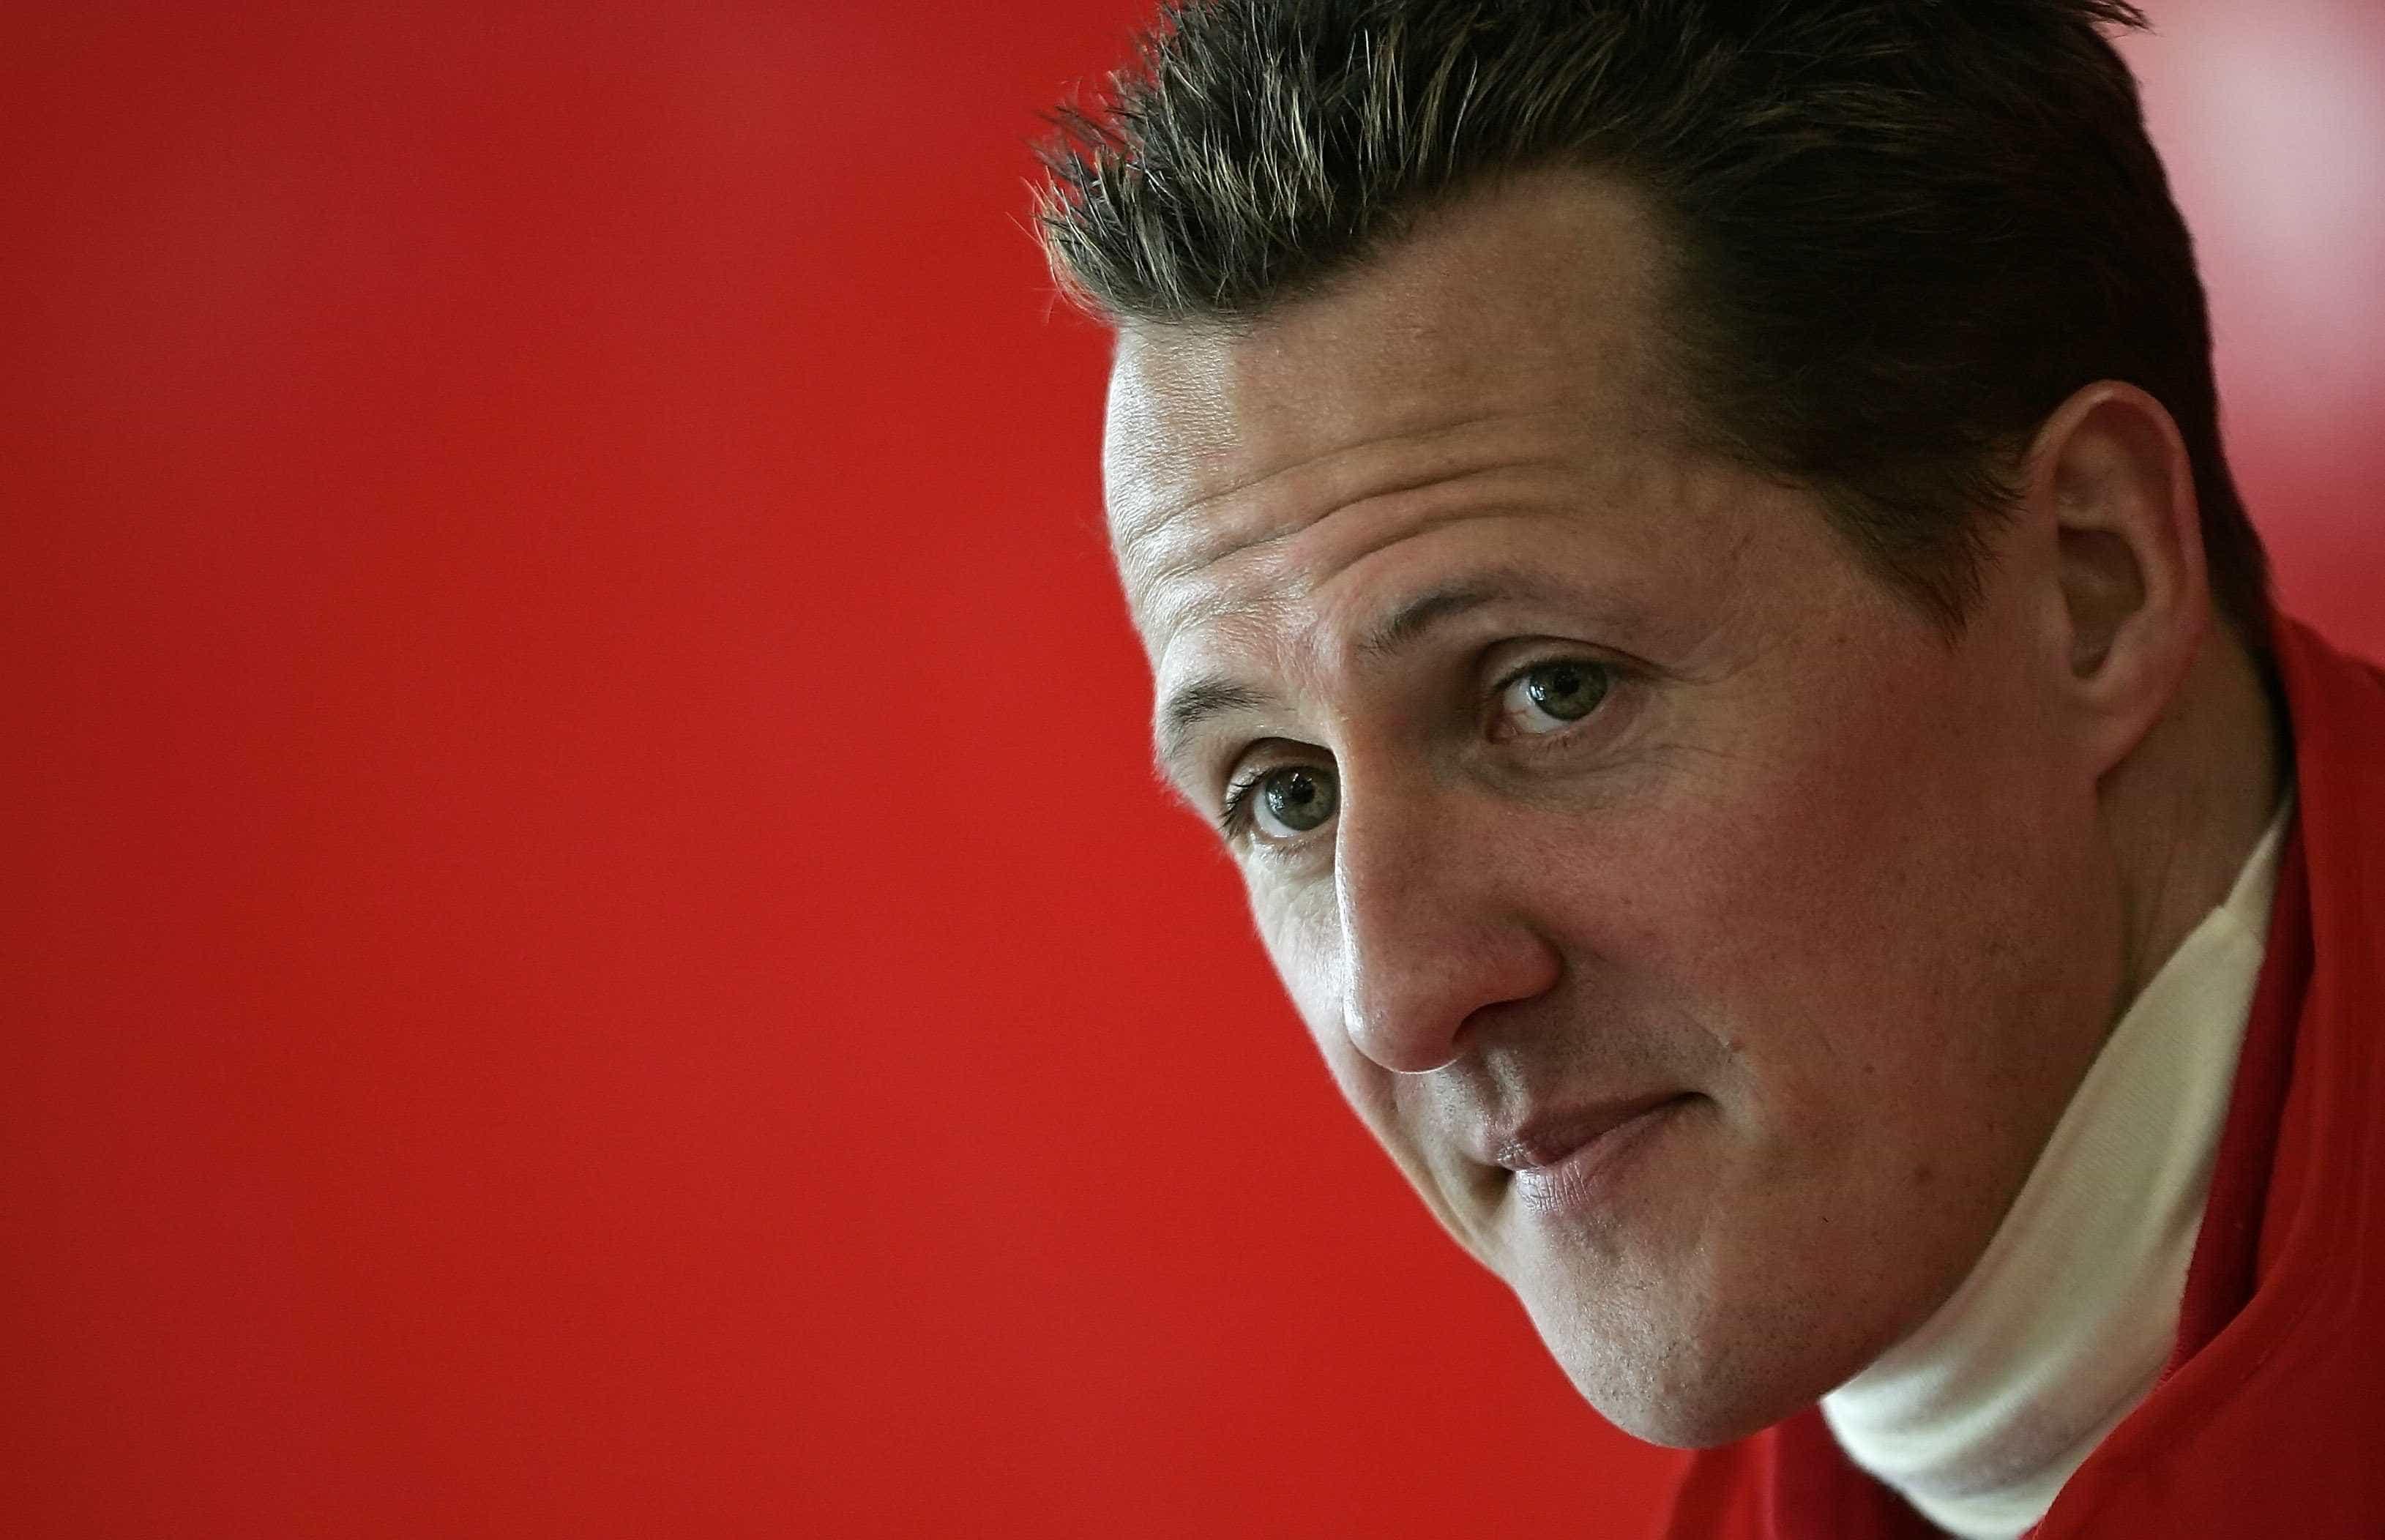 Mulher de Michael Schumacher deixa 'promessa' aos fãs do piloto